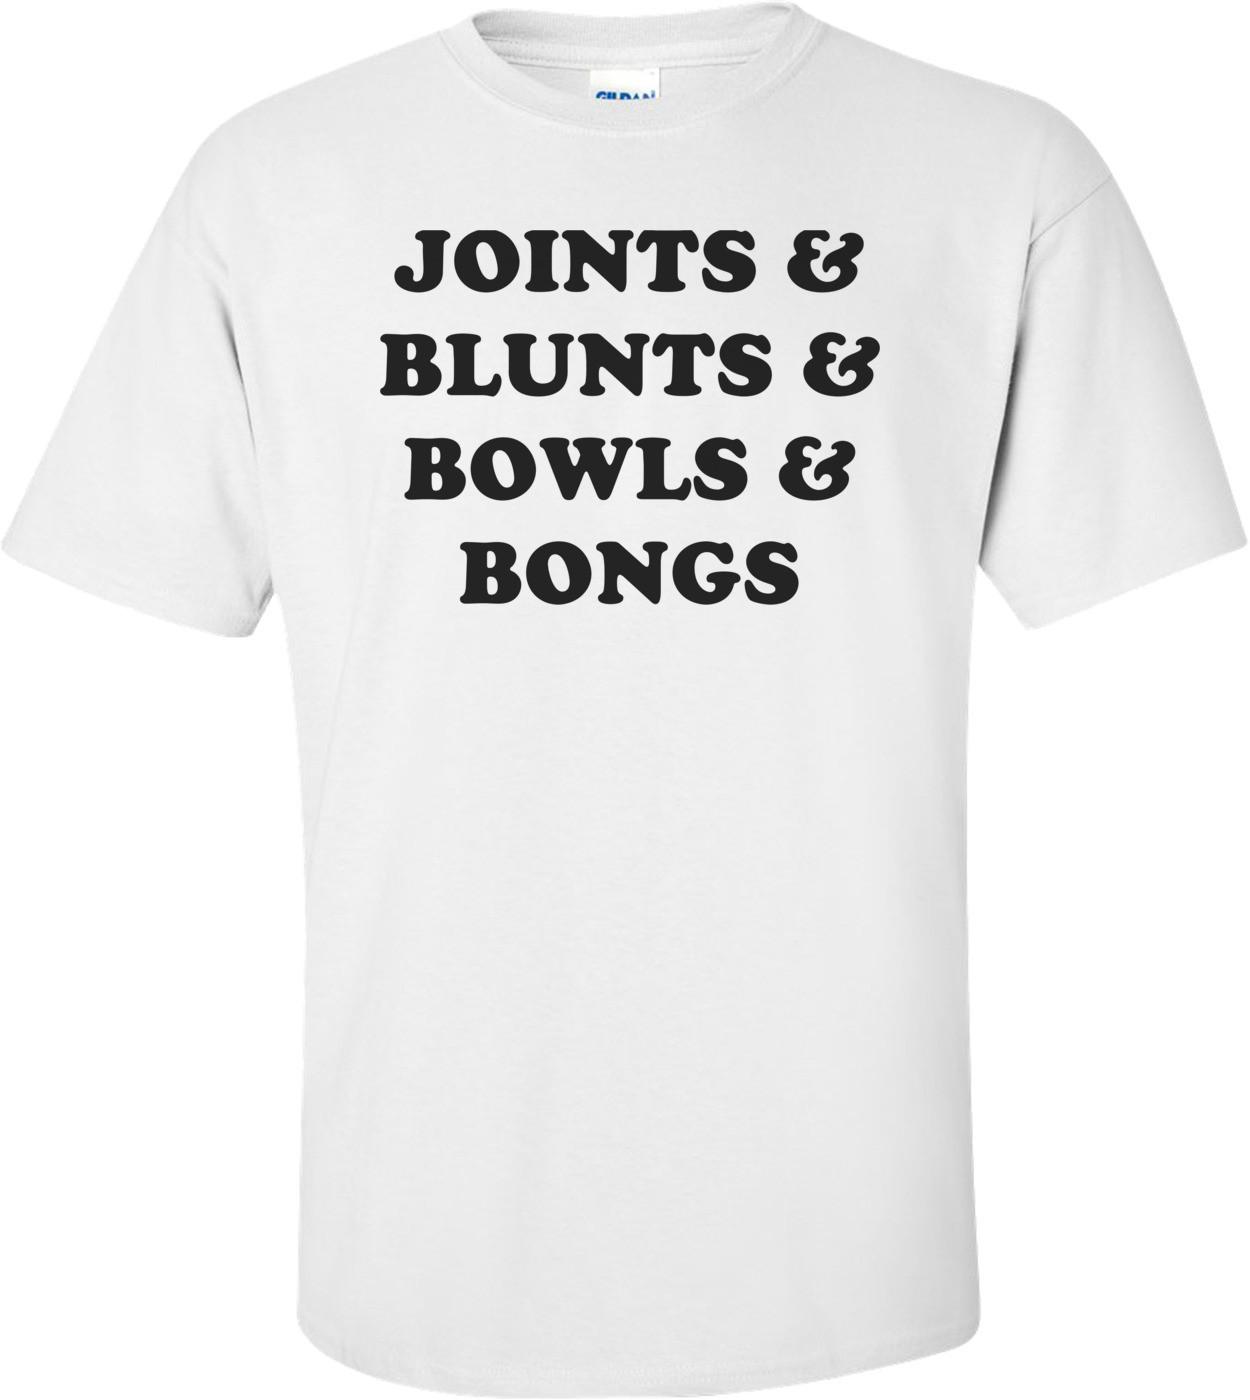 JOINTS & BLUNTS & BOWLS & BONGS Shirt